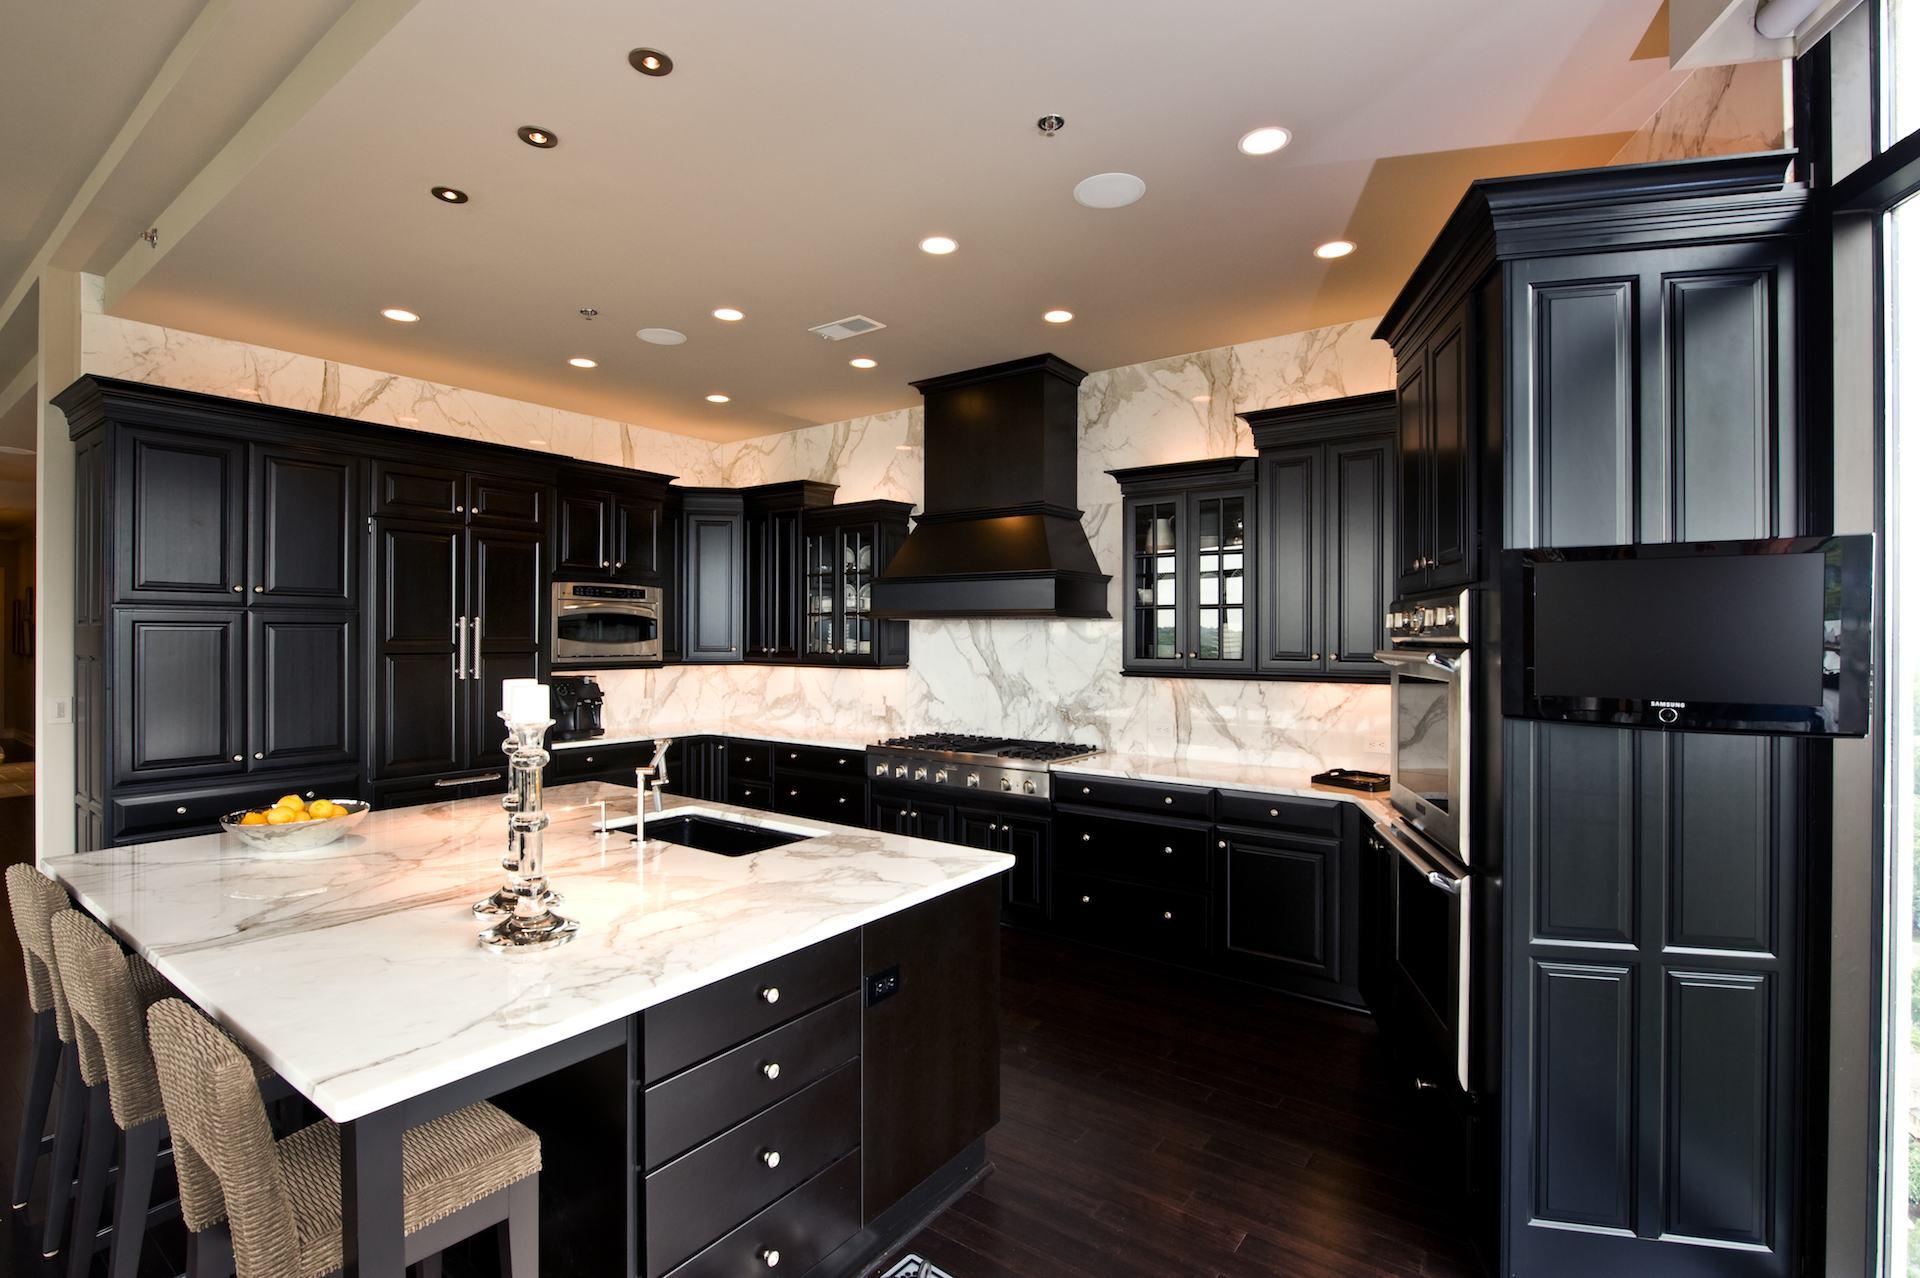 black kitchen cabinets with dark floors photo - 4